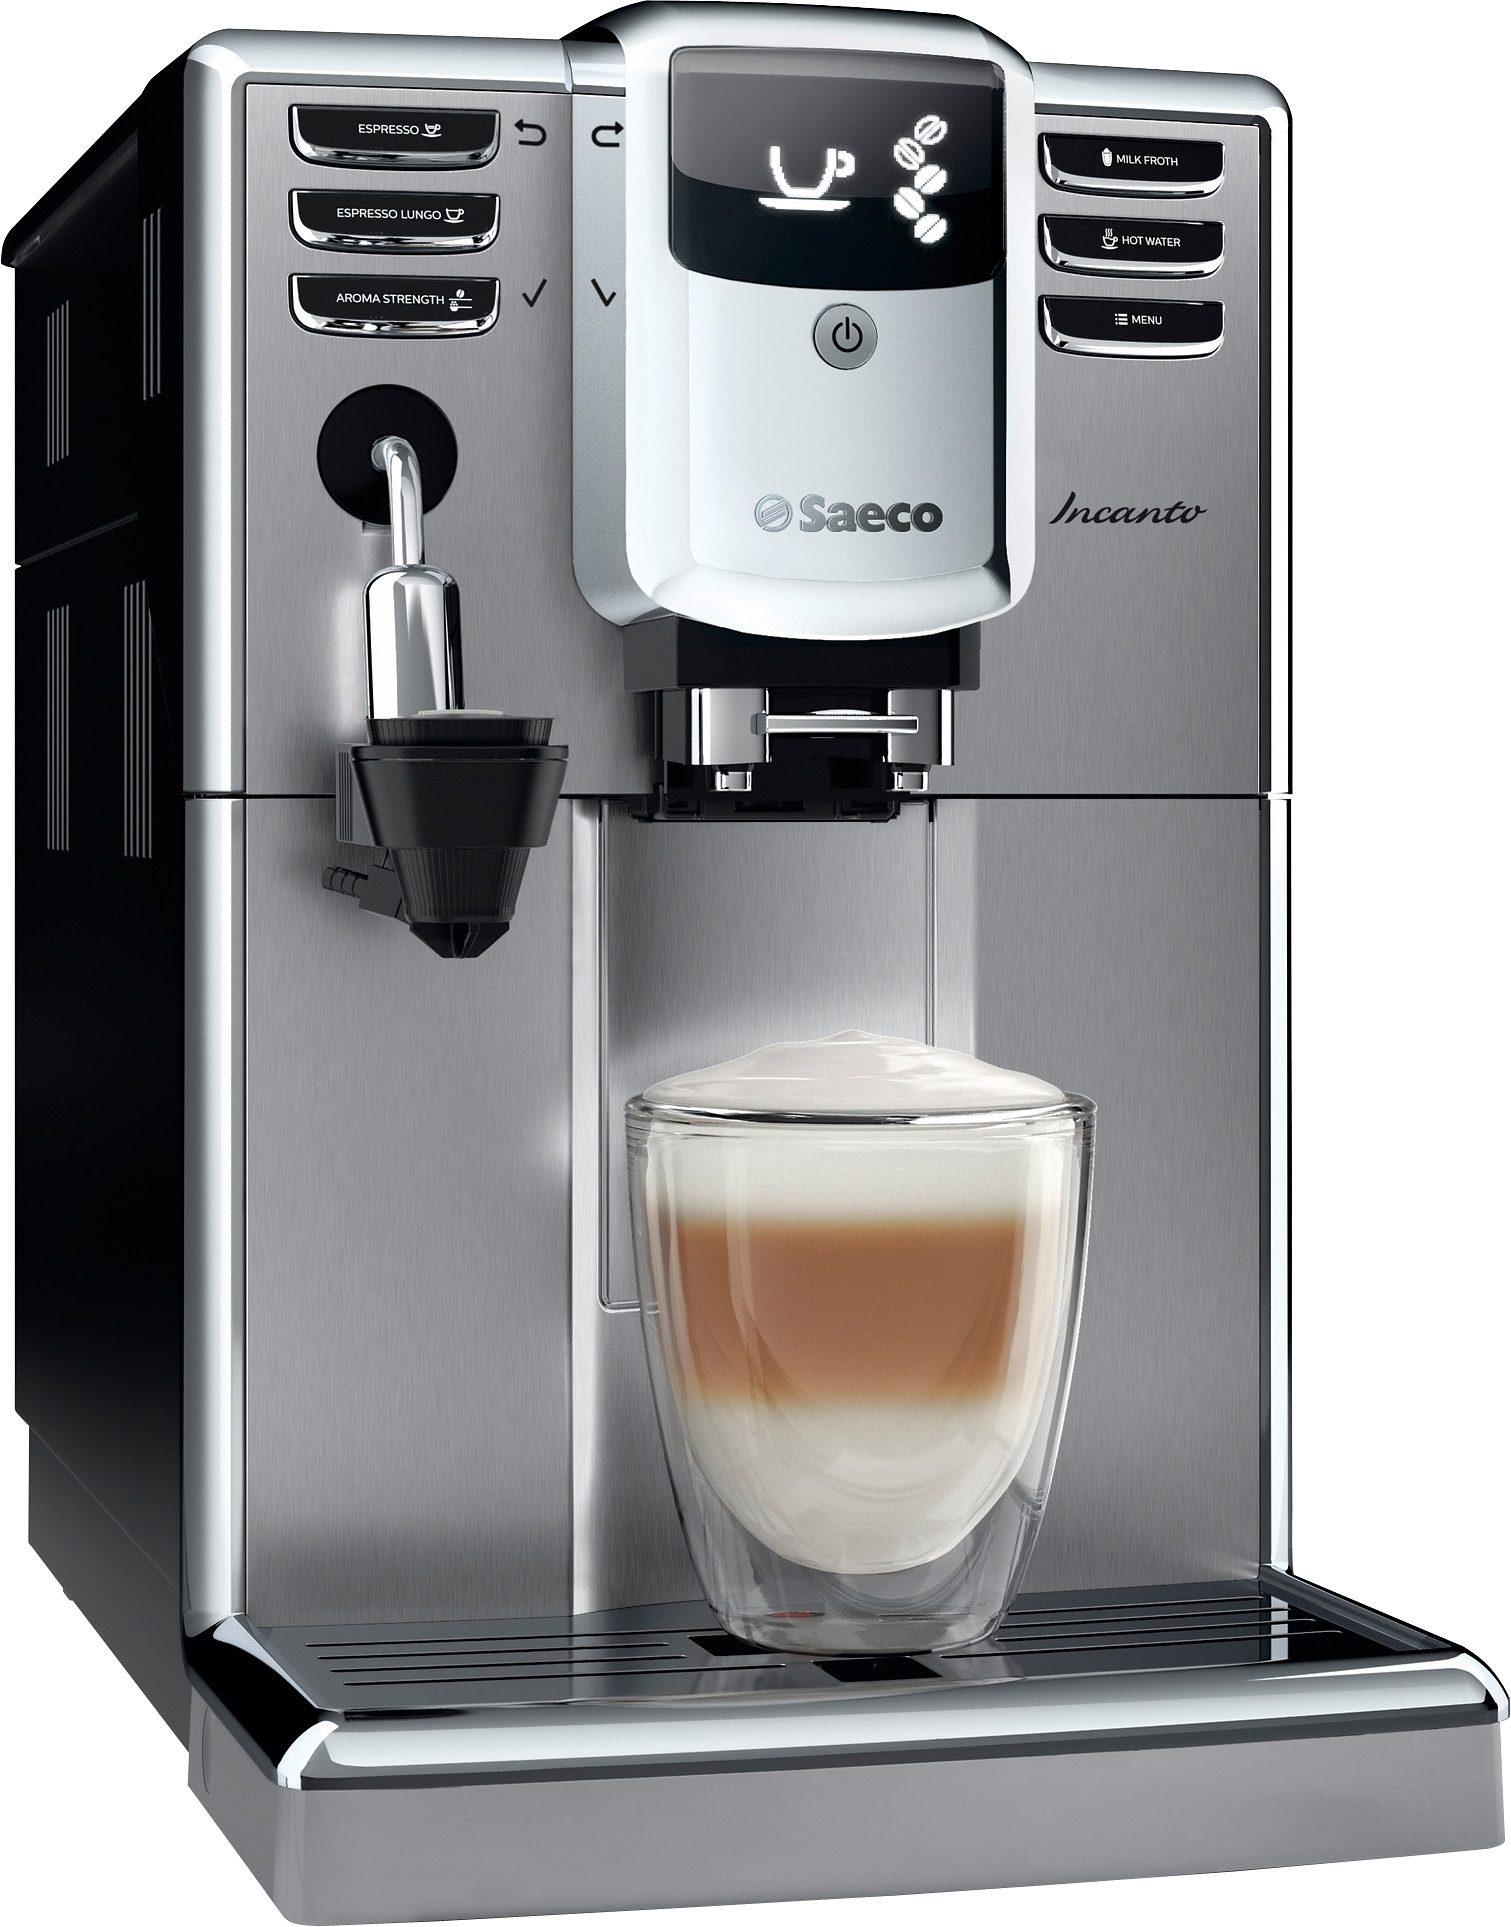 Saeco Kaffeevollautomat HD8914/01 Incanto, 1,8l Tank, Scheibenmahlwerk, mit Cappuccinatore